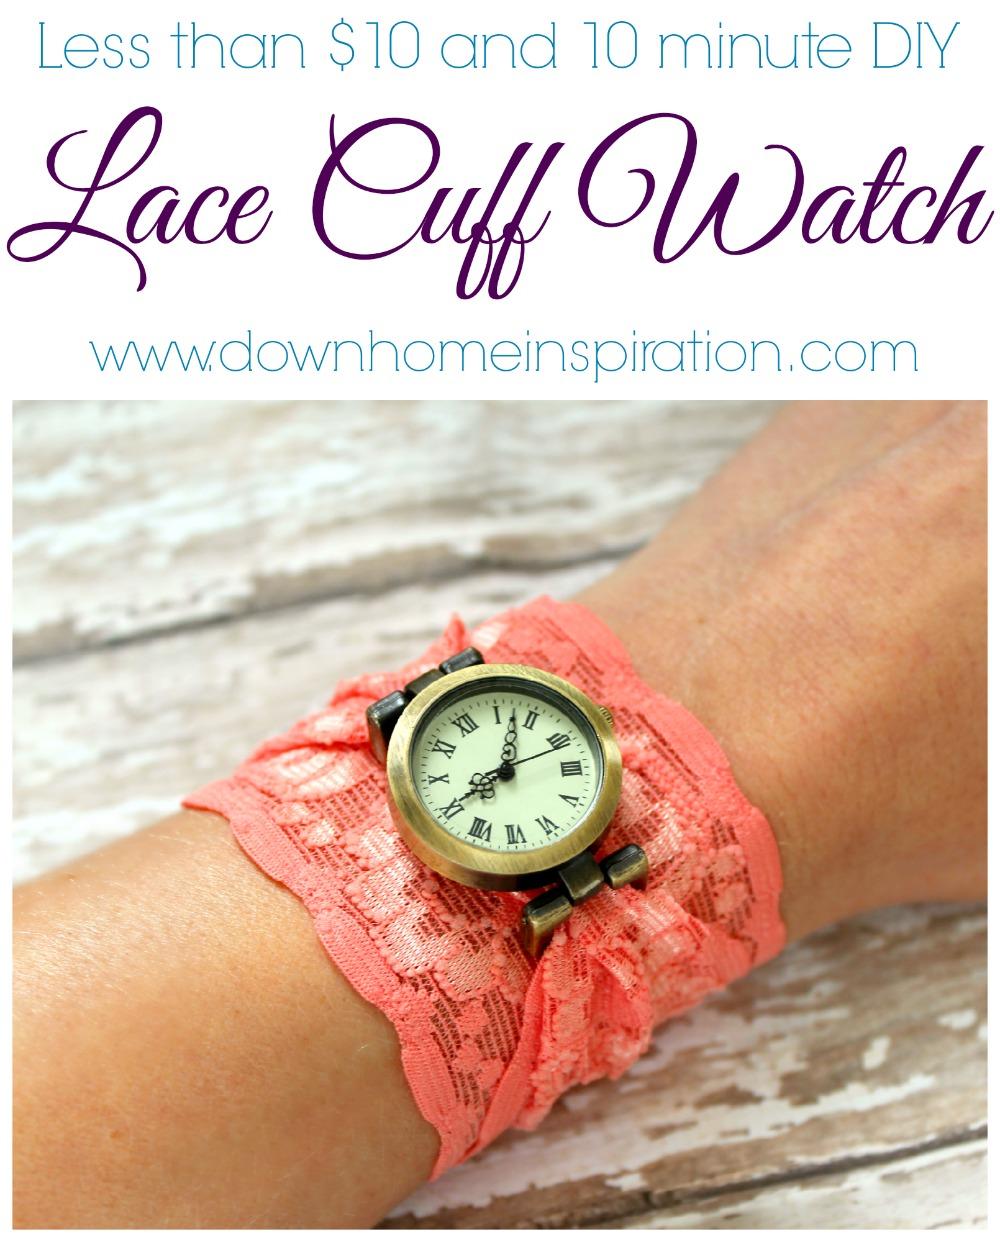 DIY-Lace-Cuff-Watch-5